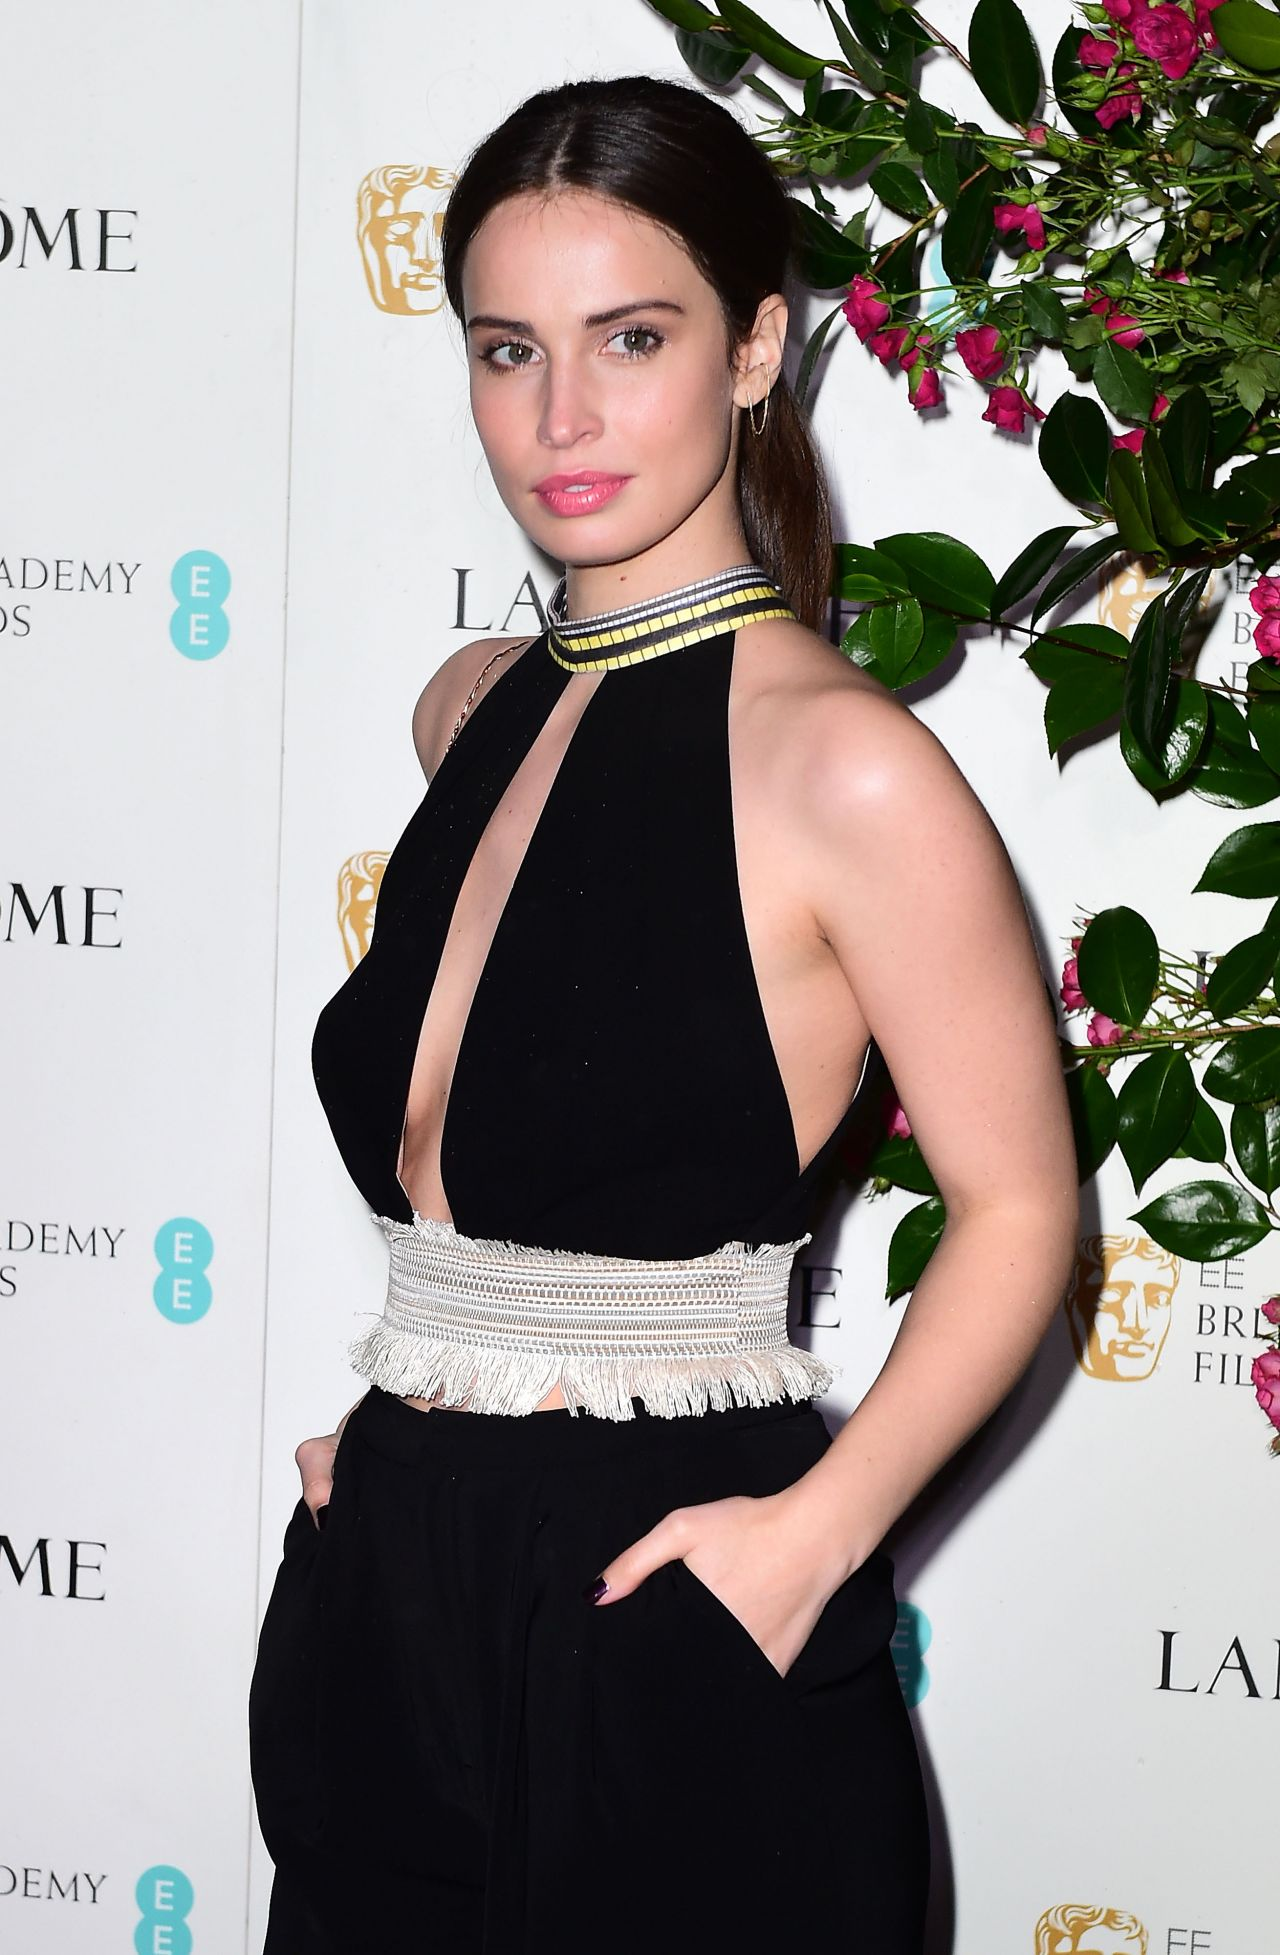 Heida Reed Lancome Bafta Nominees Party In London 2 13 2016